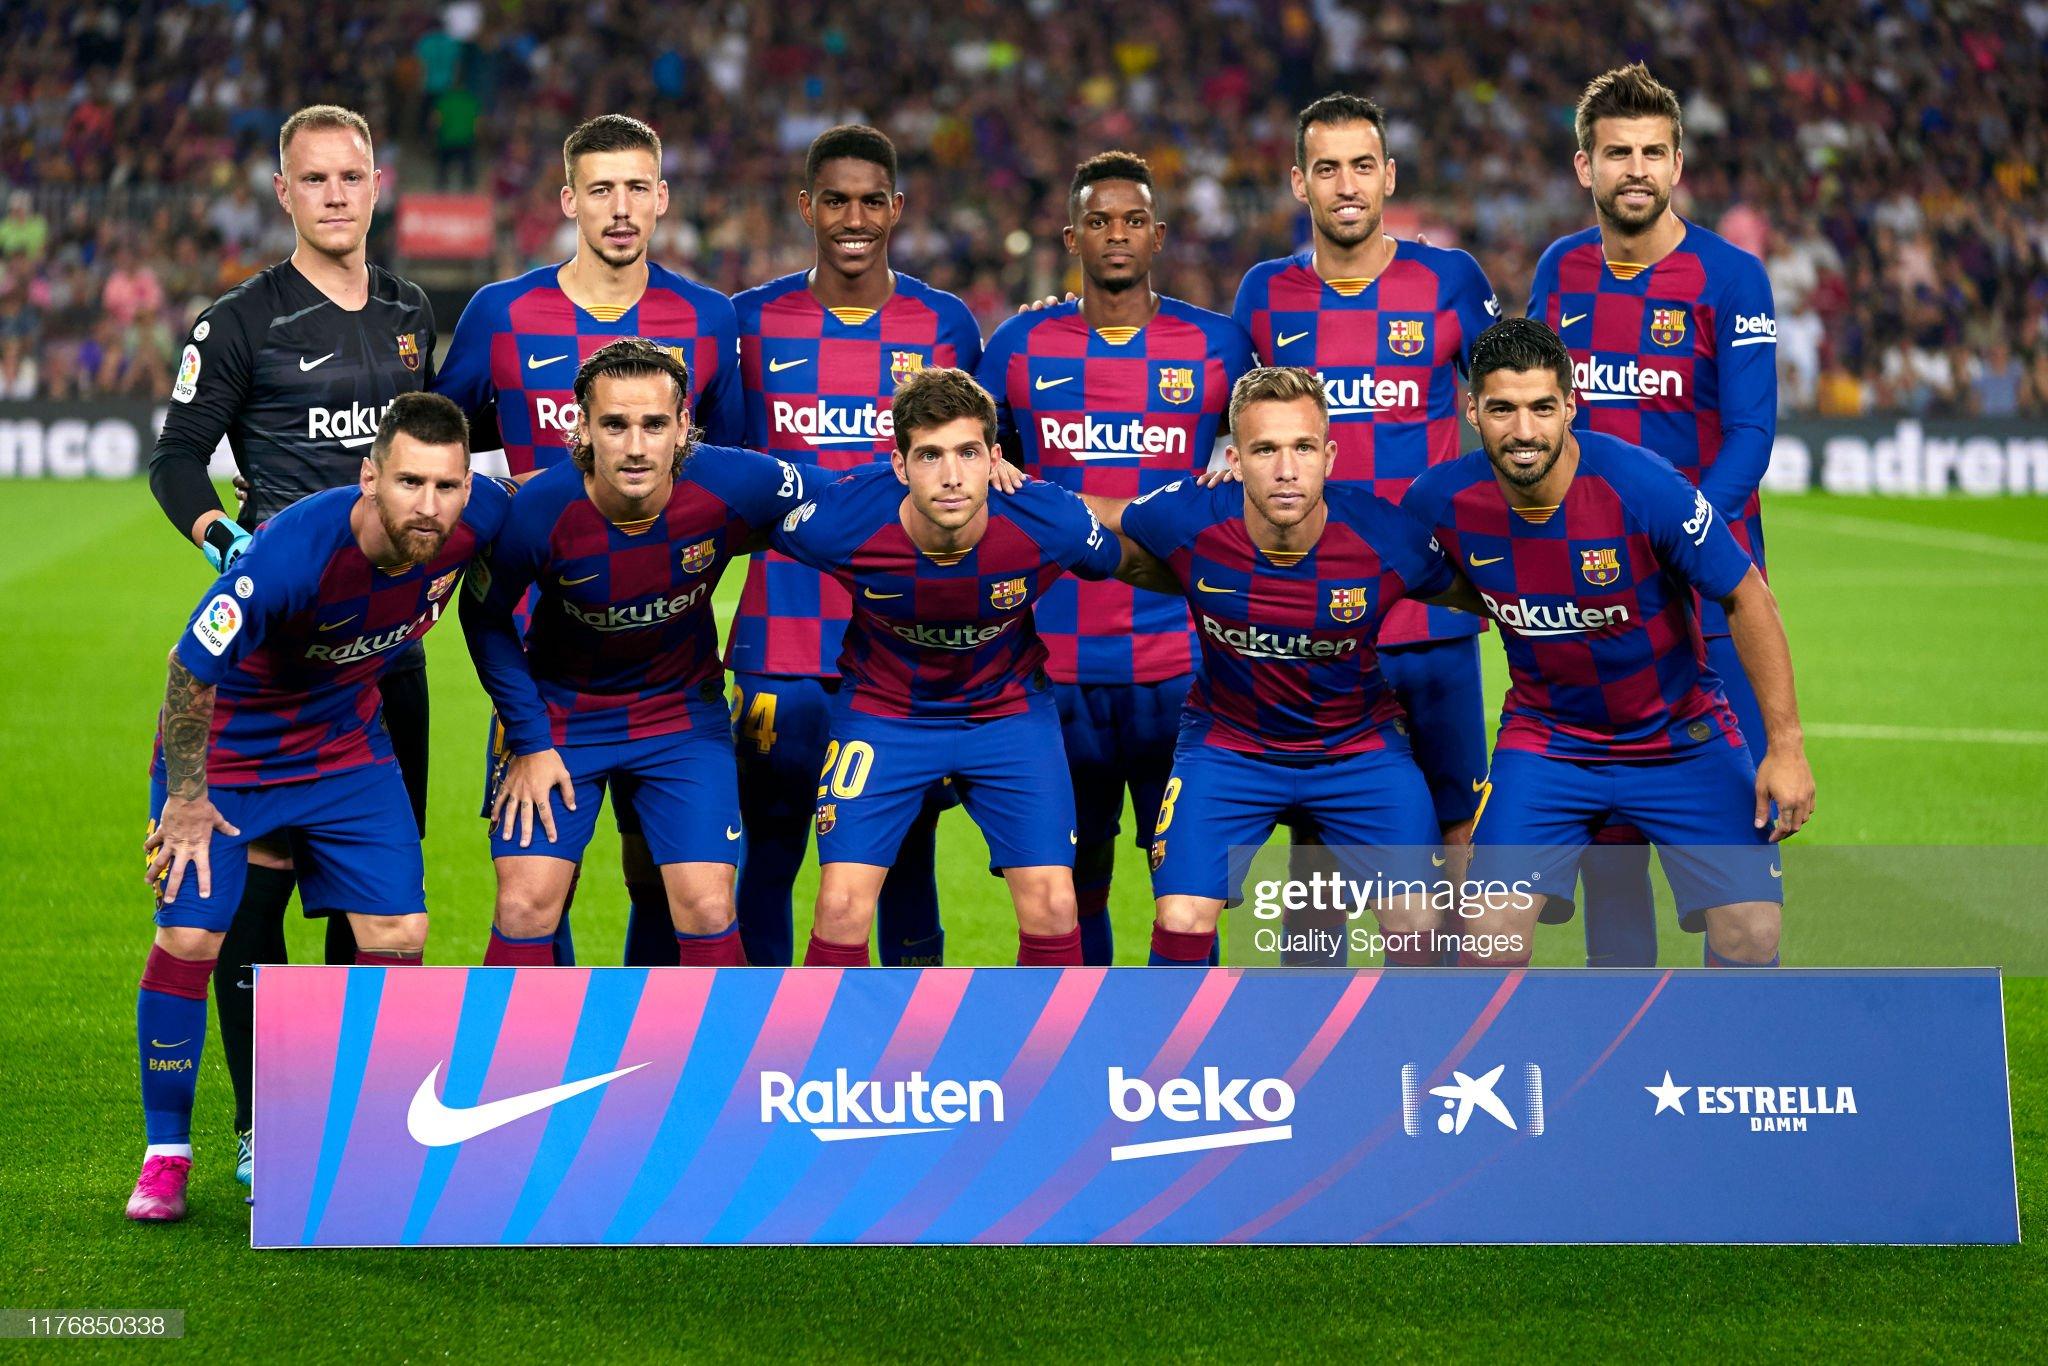 صور مباراة : برشلونة - فياريال 2-1 ( 24-09-2019 )  Players-of-fc-barcelona-poses-on-teams-line-up-prior-to-the-liga-fc-picture-id1176850338?s=2048x2048